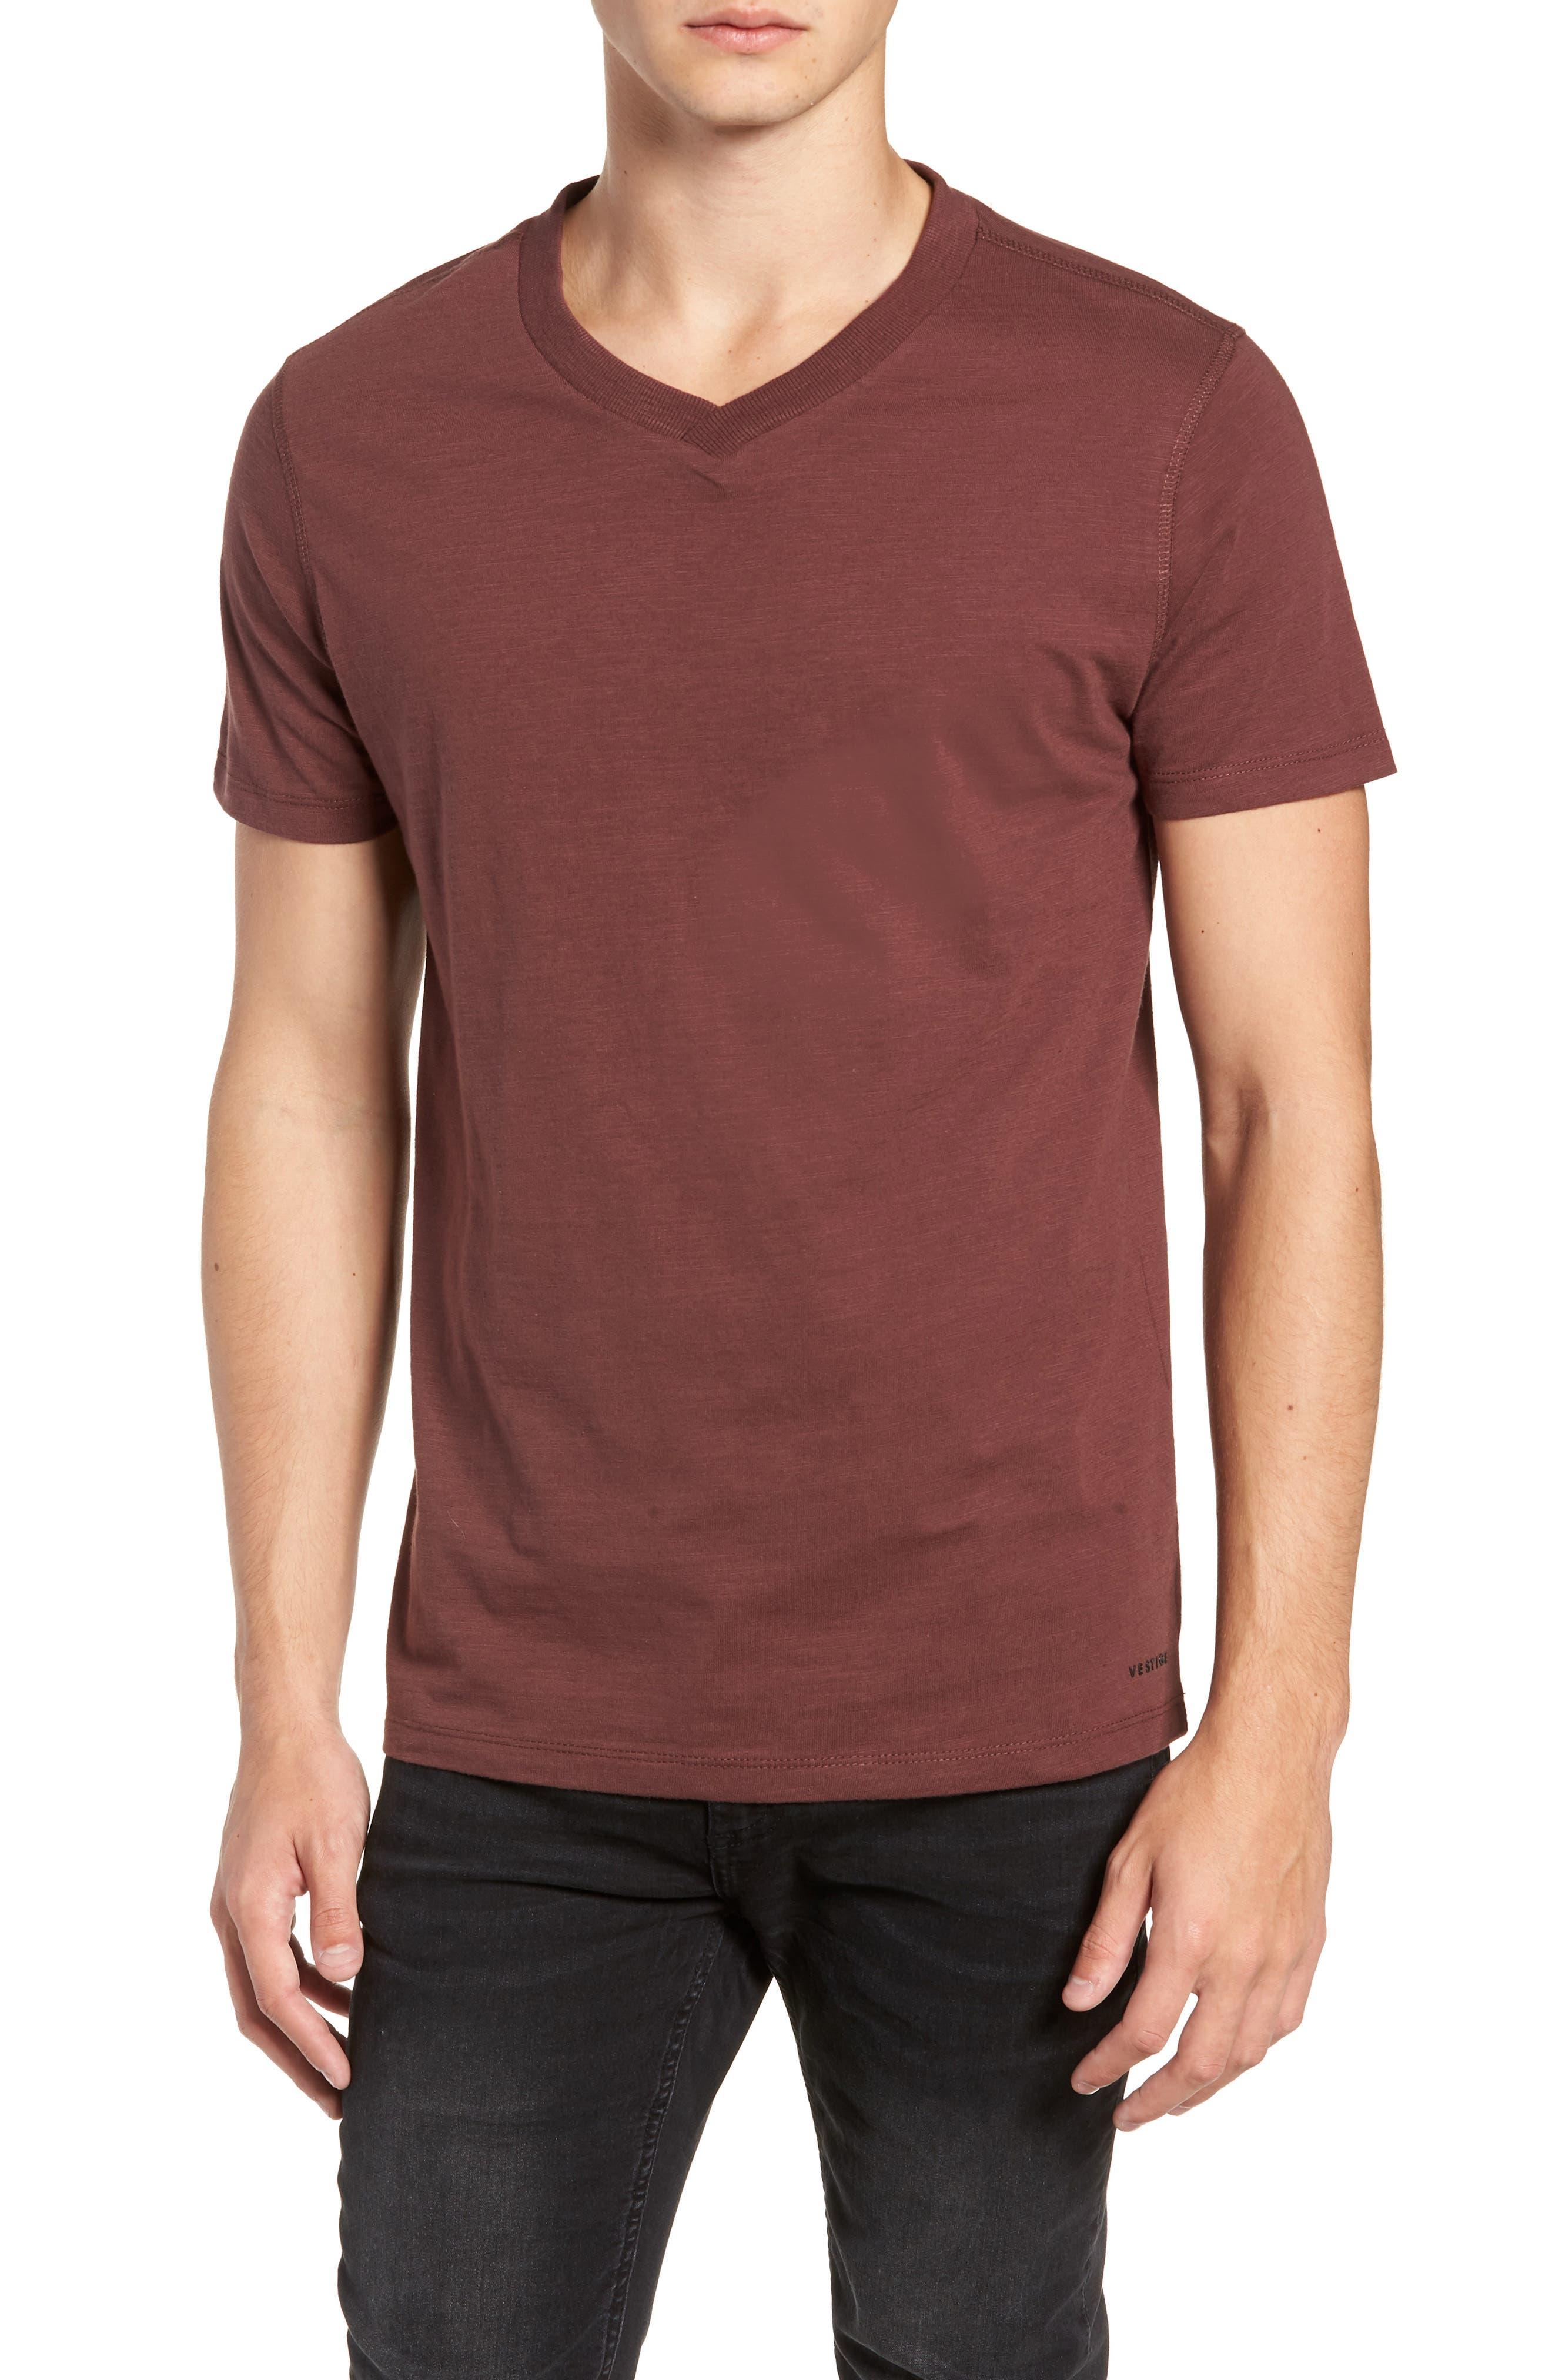 Soccer V-Neck T-Shirt,                         Main,                         color, BURGUNDY